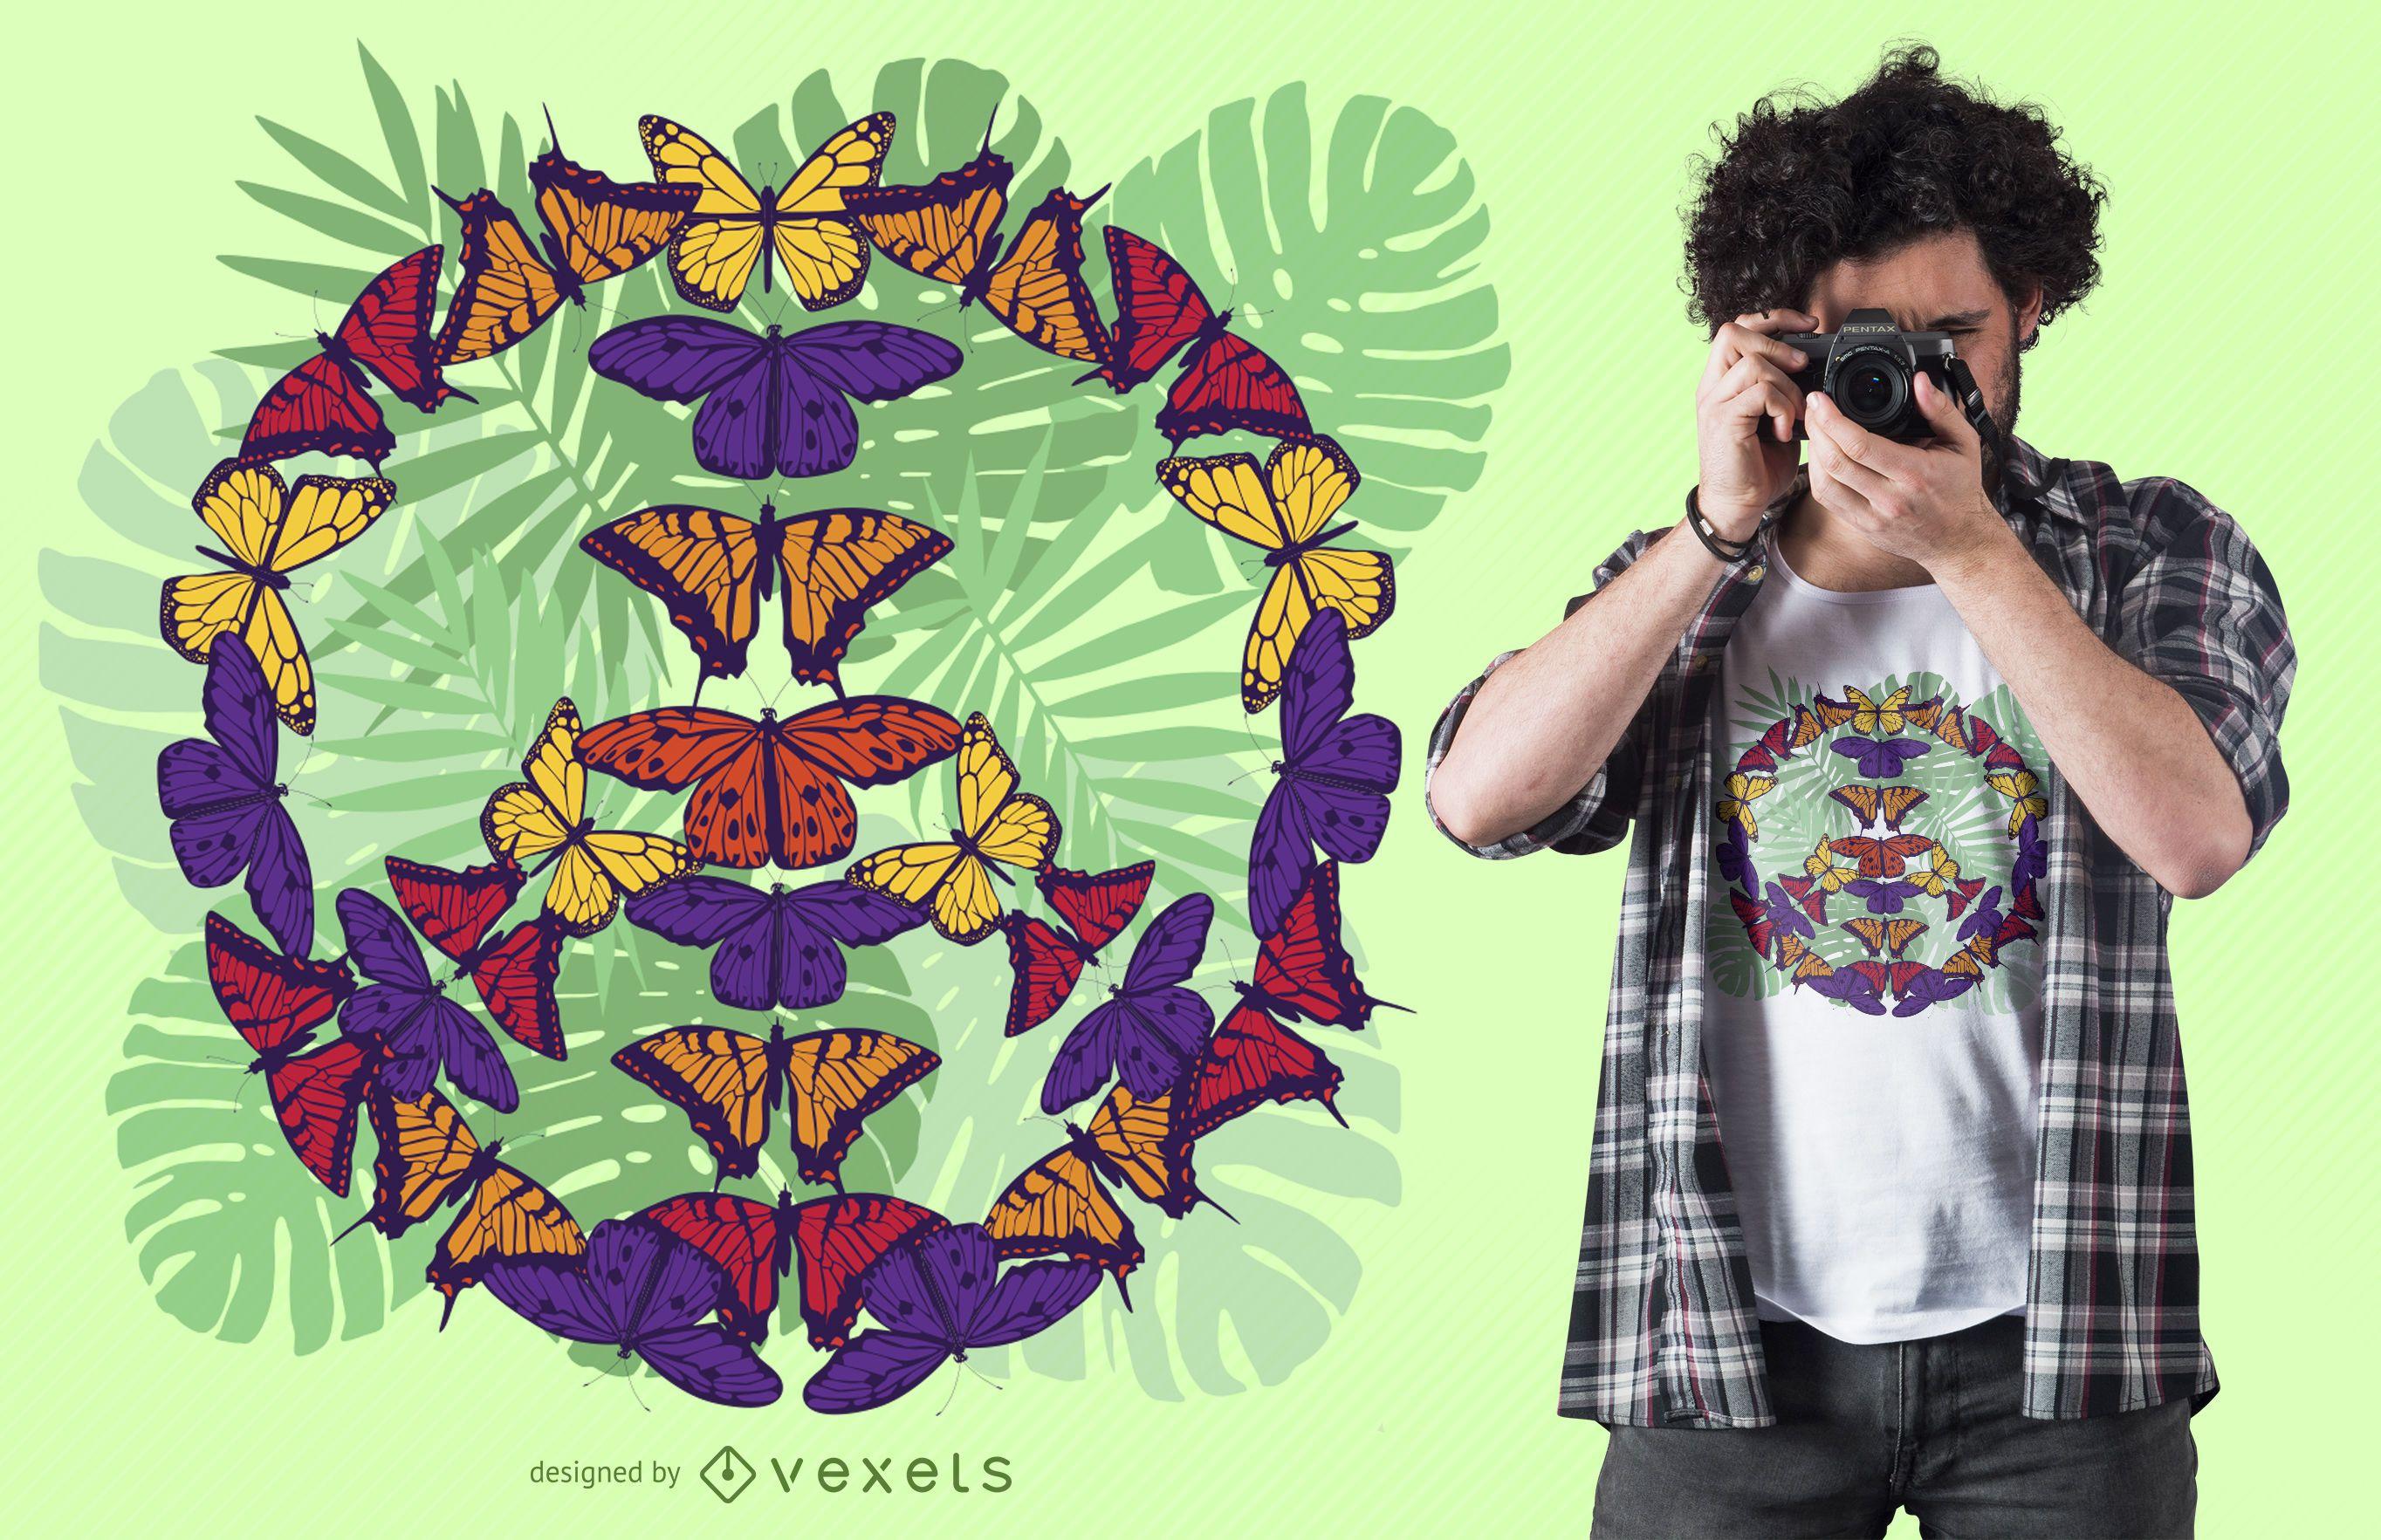 Dise?o de camiseta de signo de la paz de mariposa.